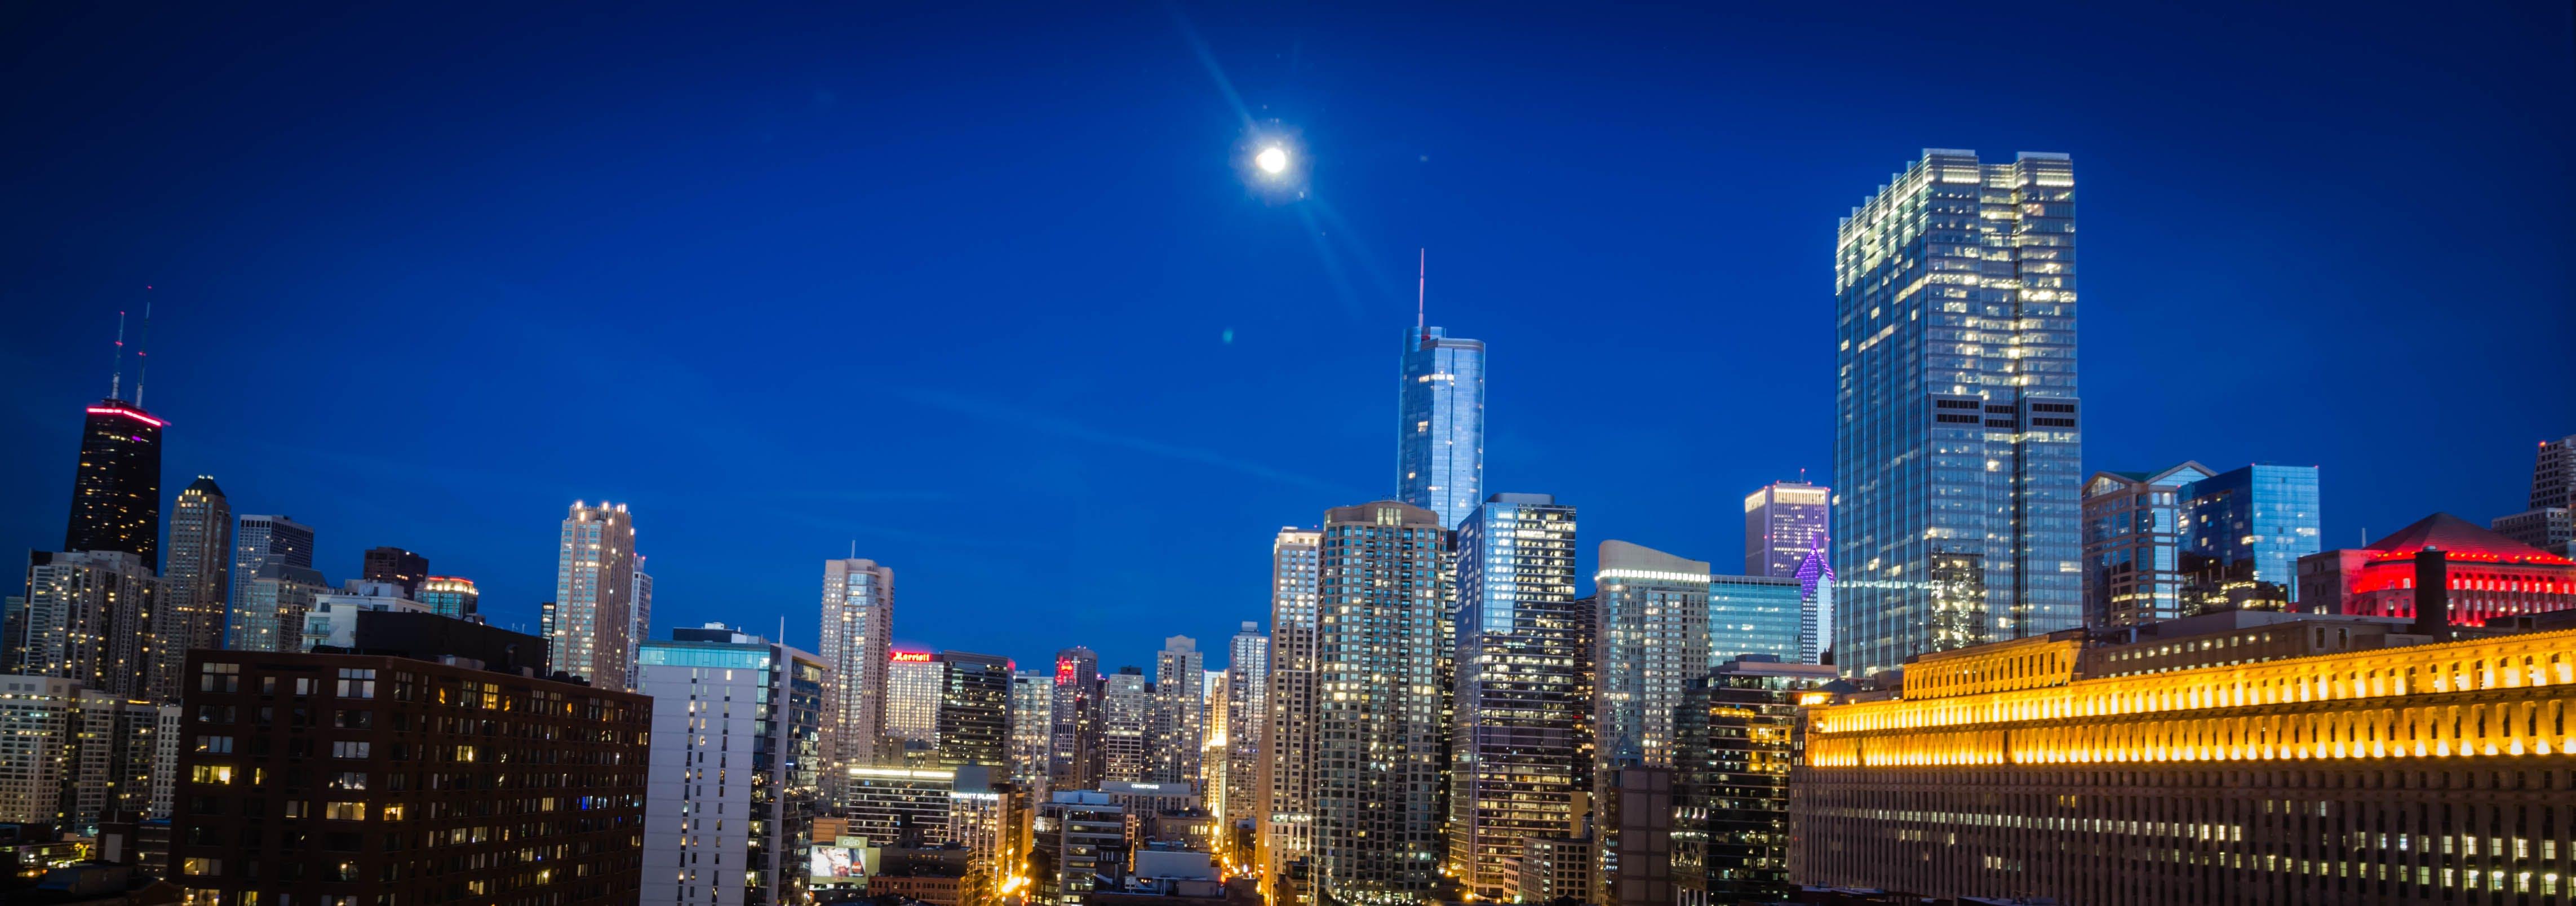 Free stock photo of chicago, city, cityscape, moonlight